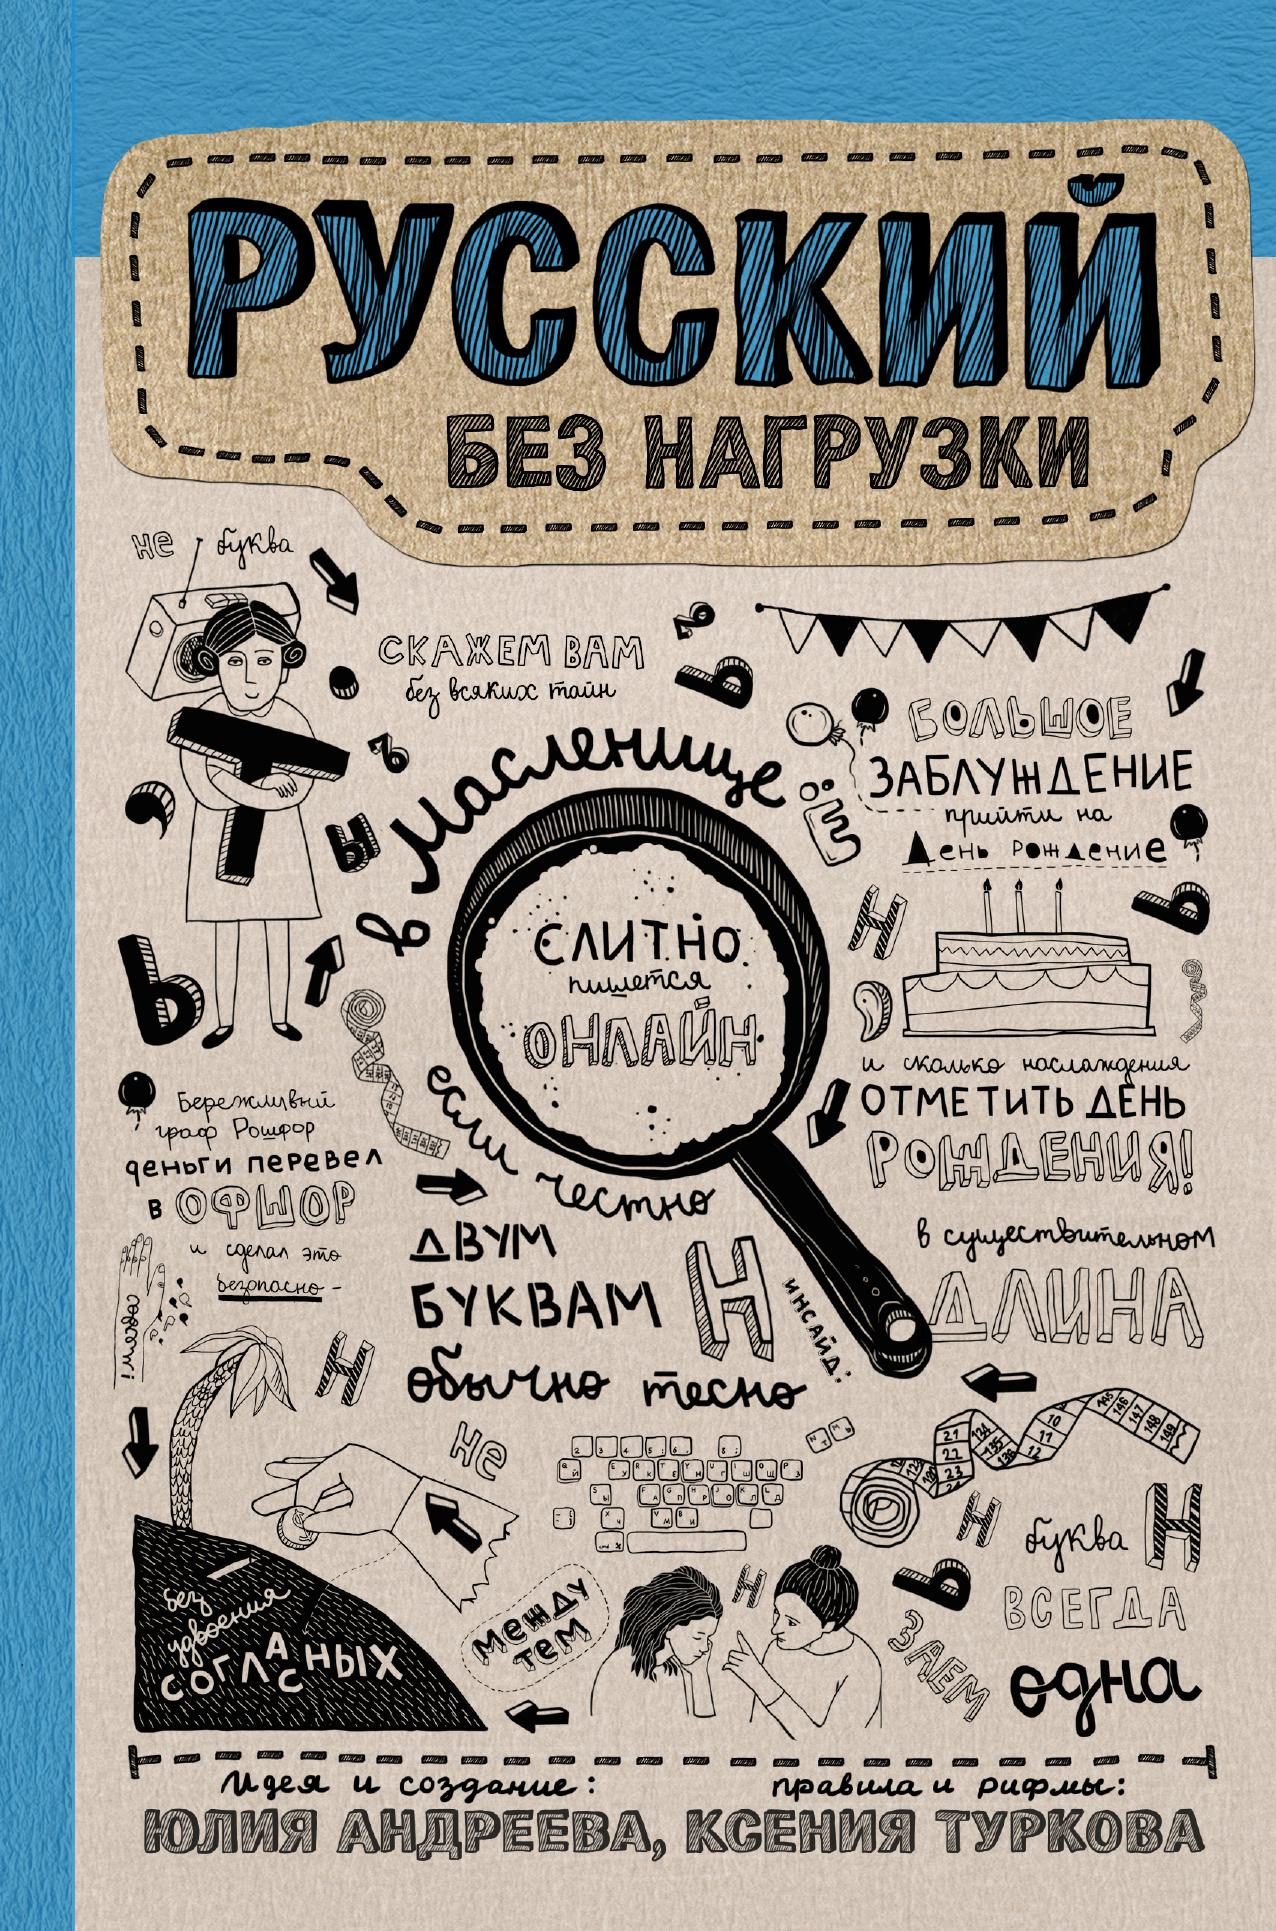 Андреева Ю.И., Туркова К.Д. Русский без нагрузки юлия андреева феникс